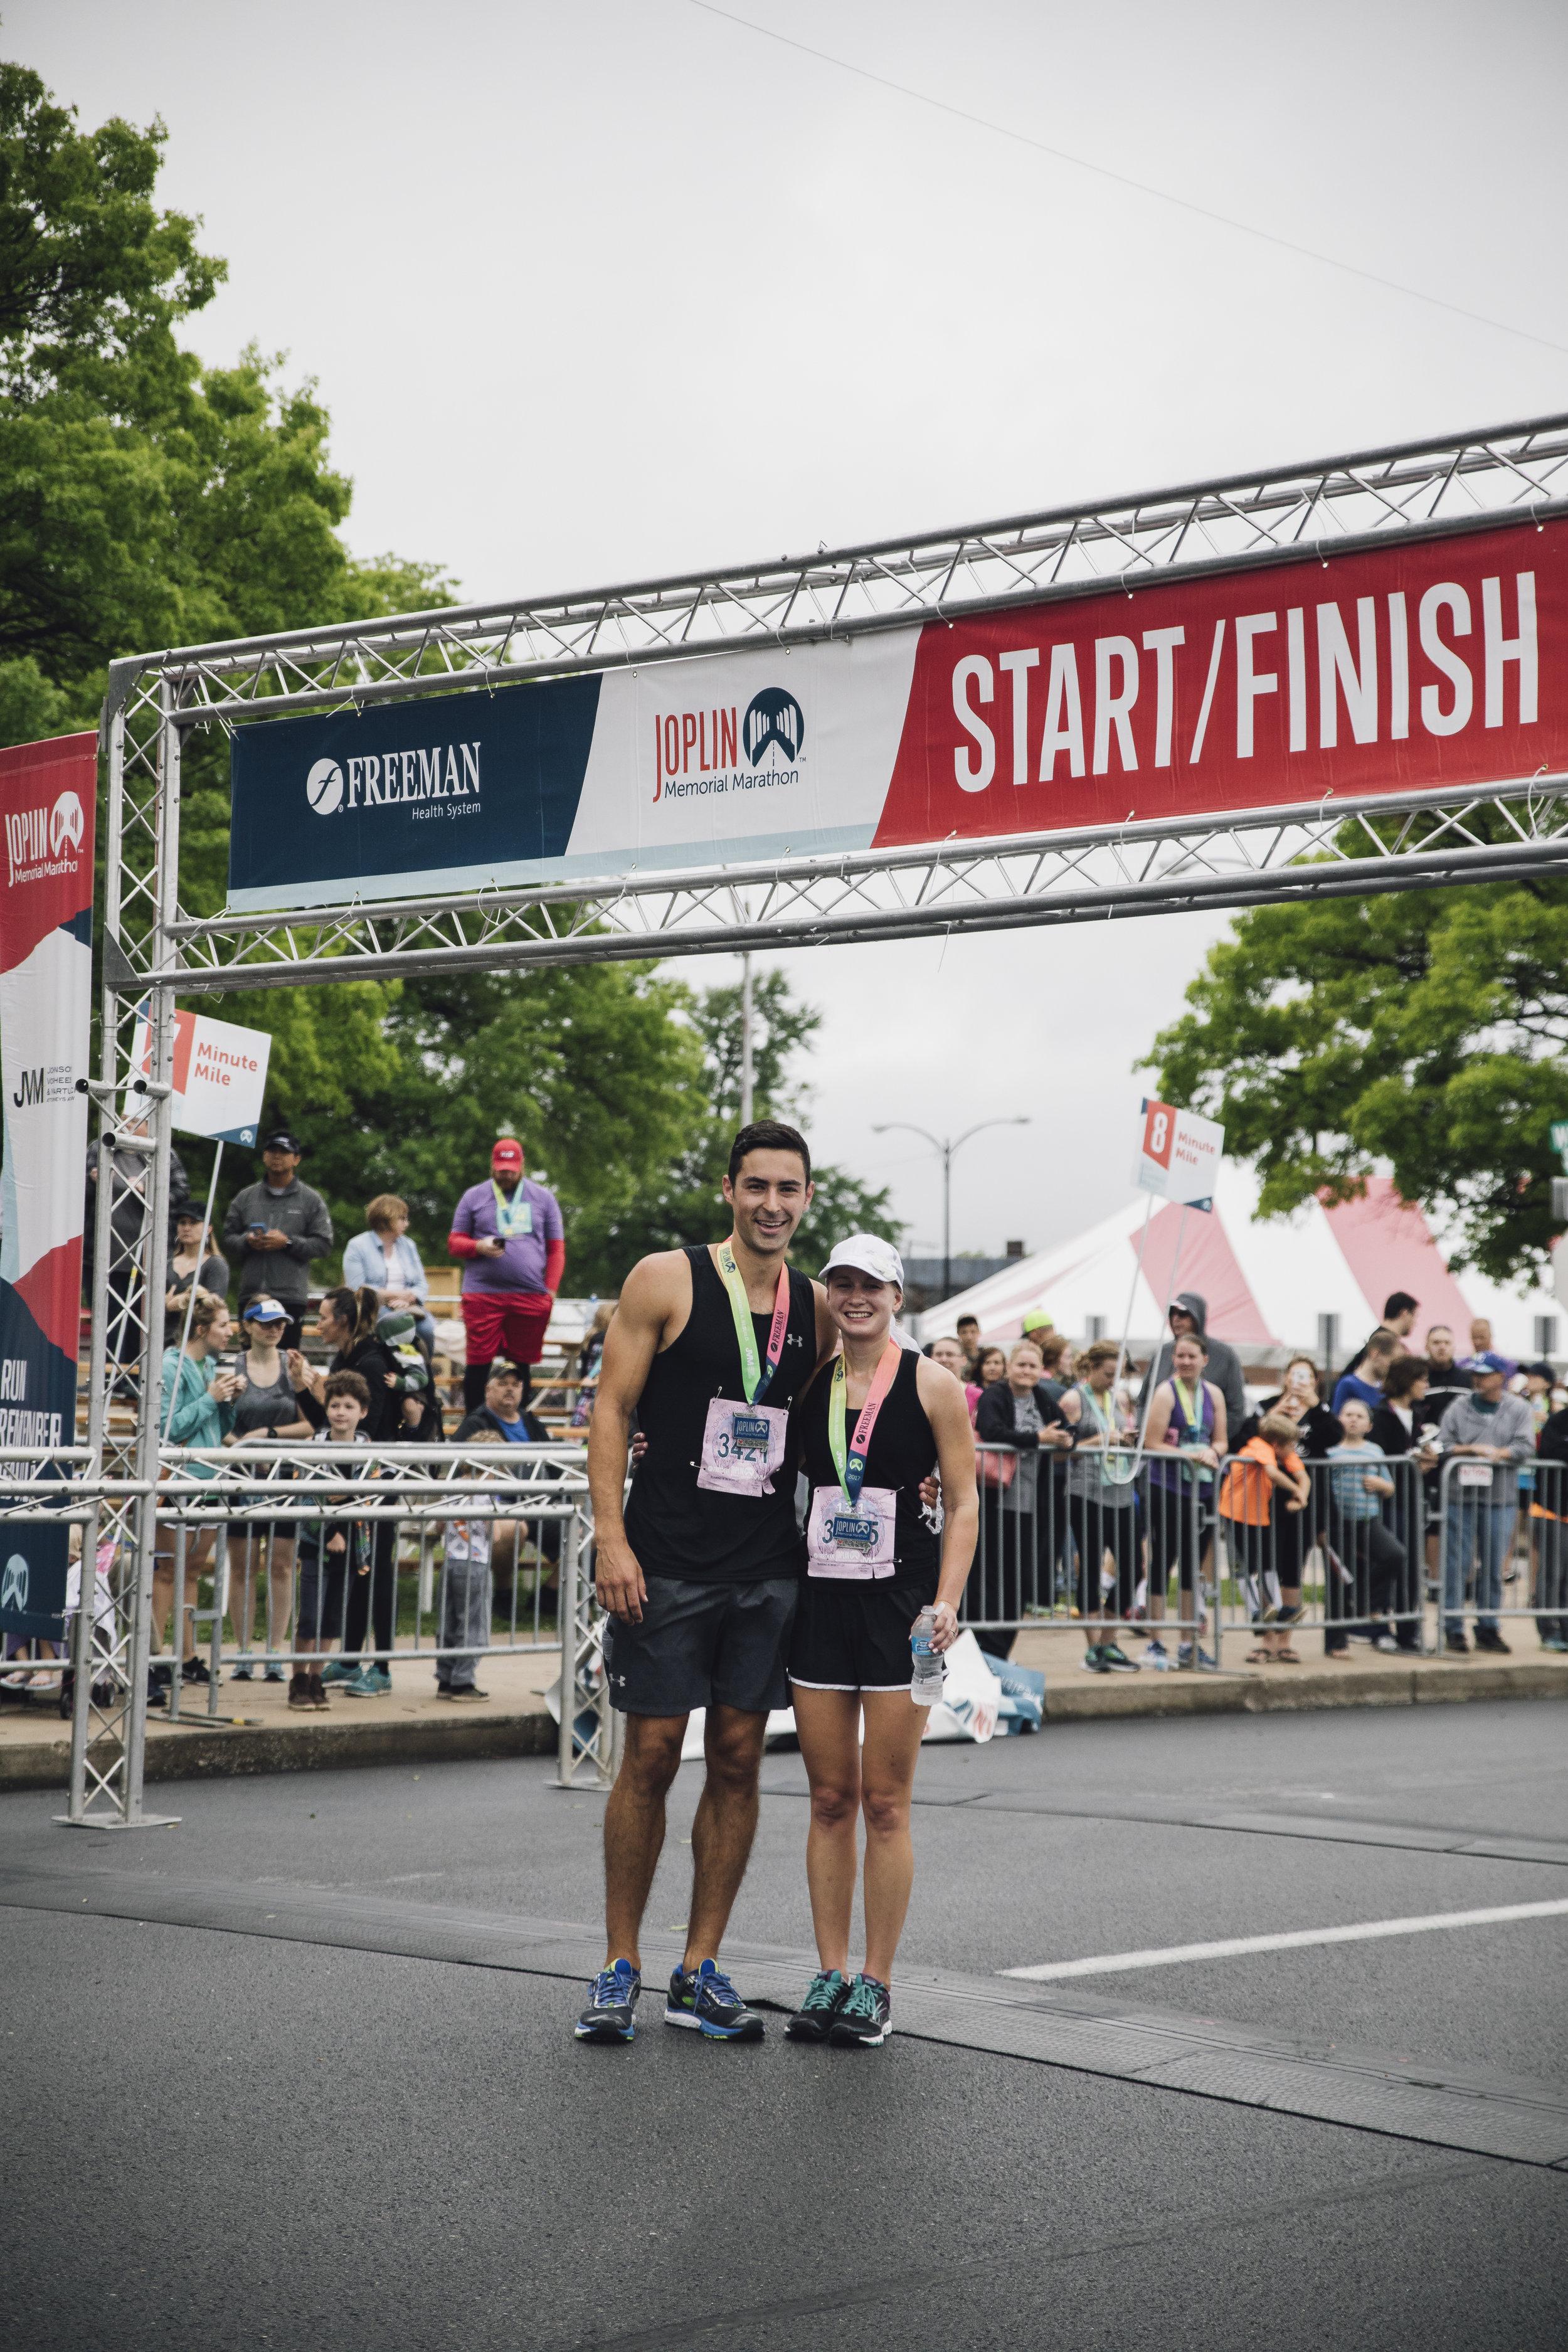 20170520_3973marathon.jpg